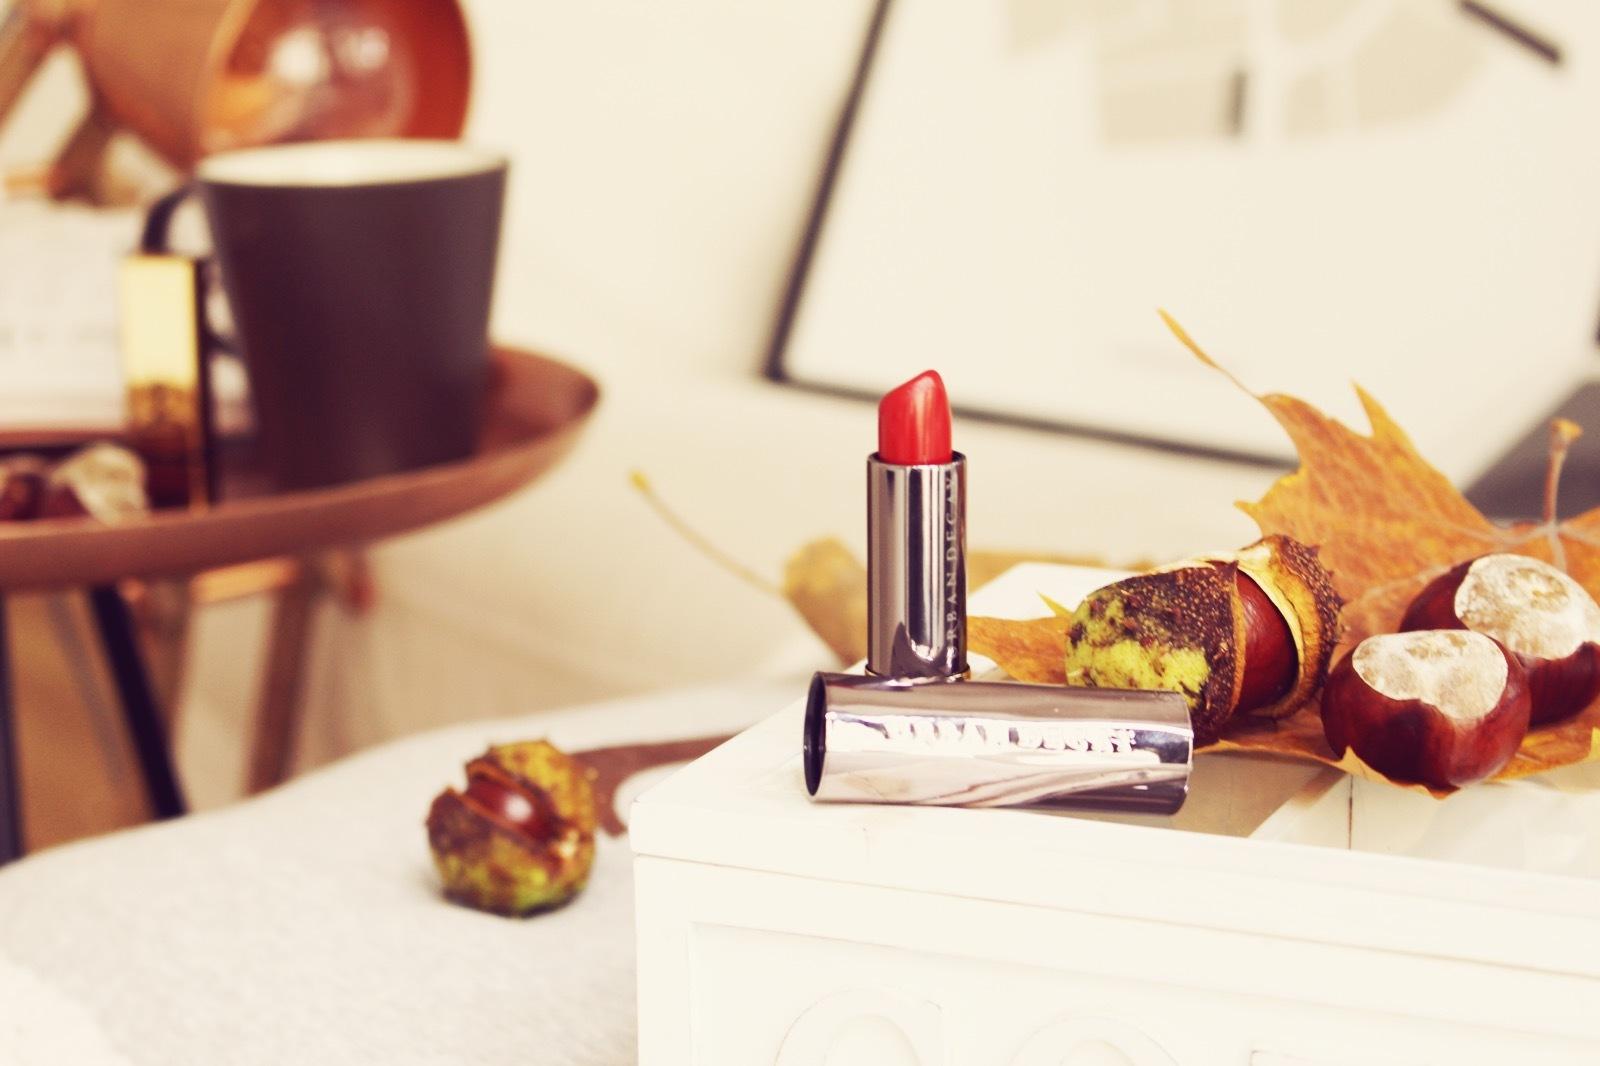 Lipstick-in-Rubinrot